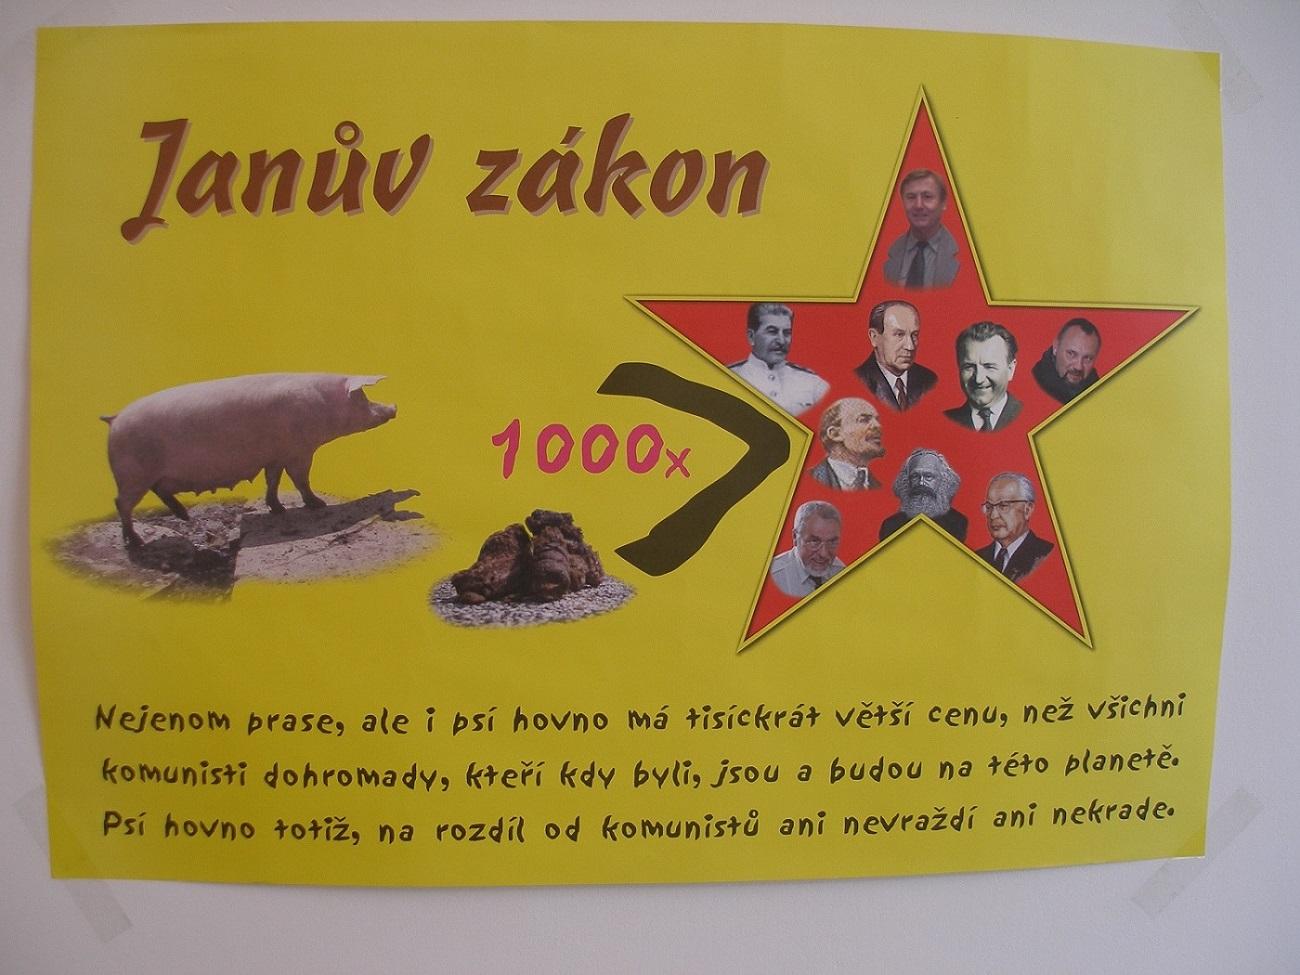 JANUV ZAKON